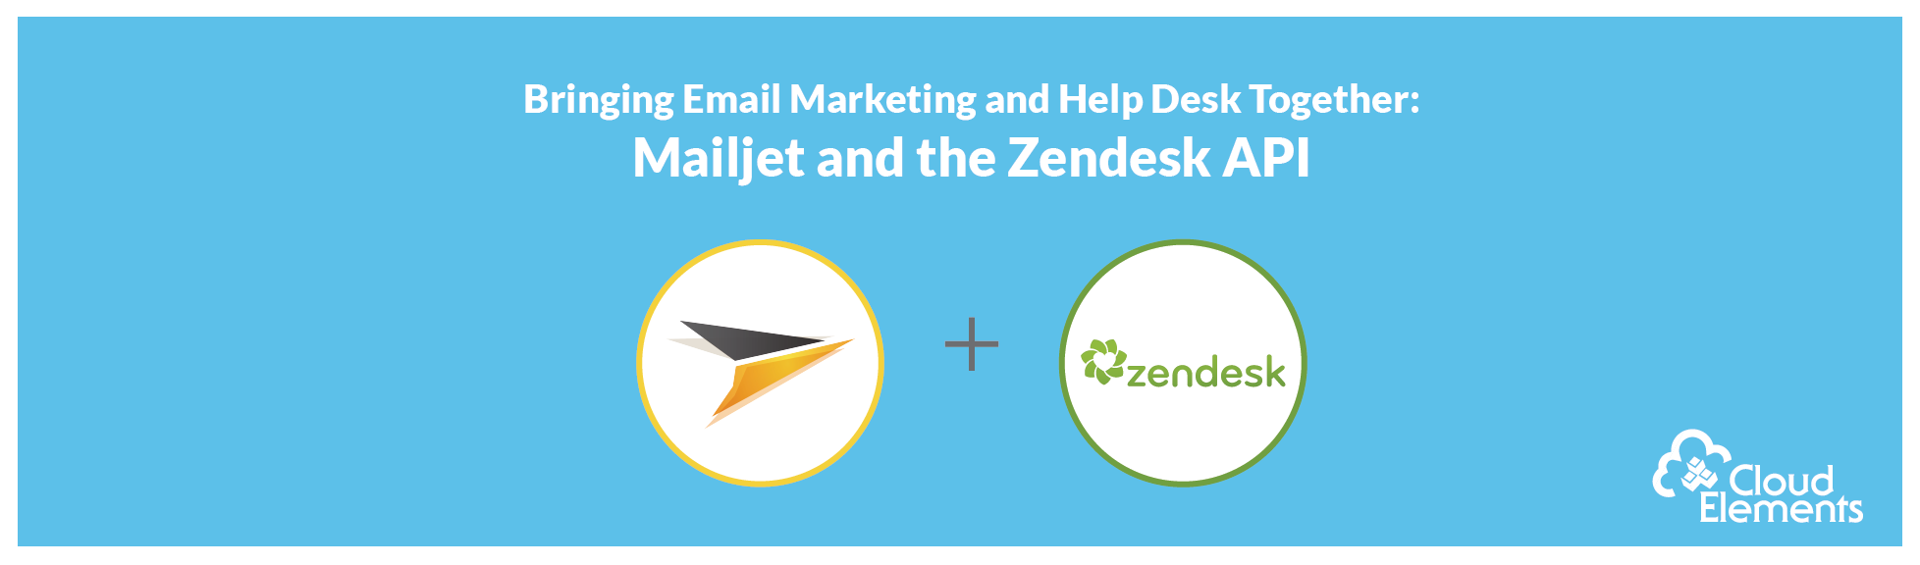 Email Marketing And Help Desk Together Mailjet amp The